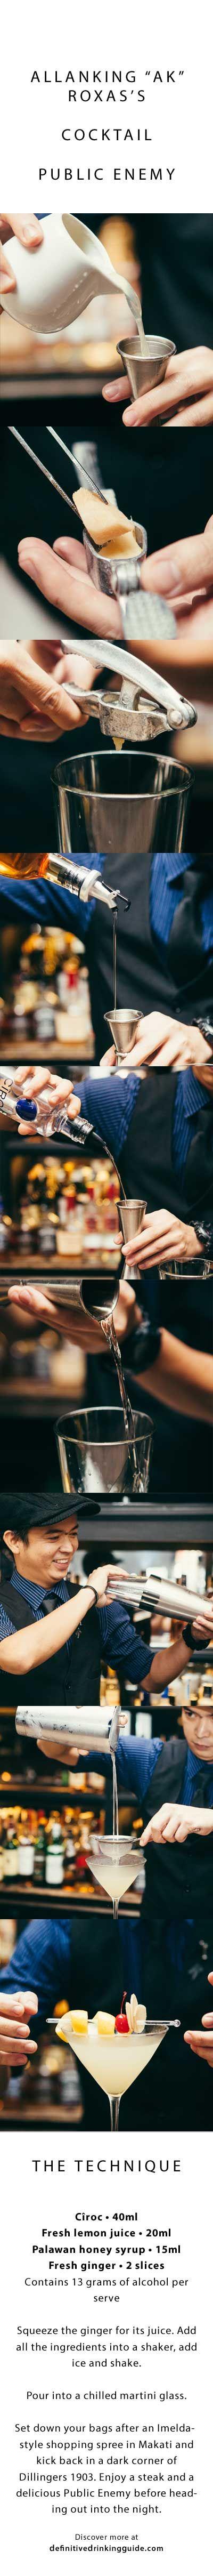 "Allanking ""AK"" Roxas´s Cocktail Public Enemy Please drink responsibly www.DRINKIQ.com"